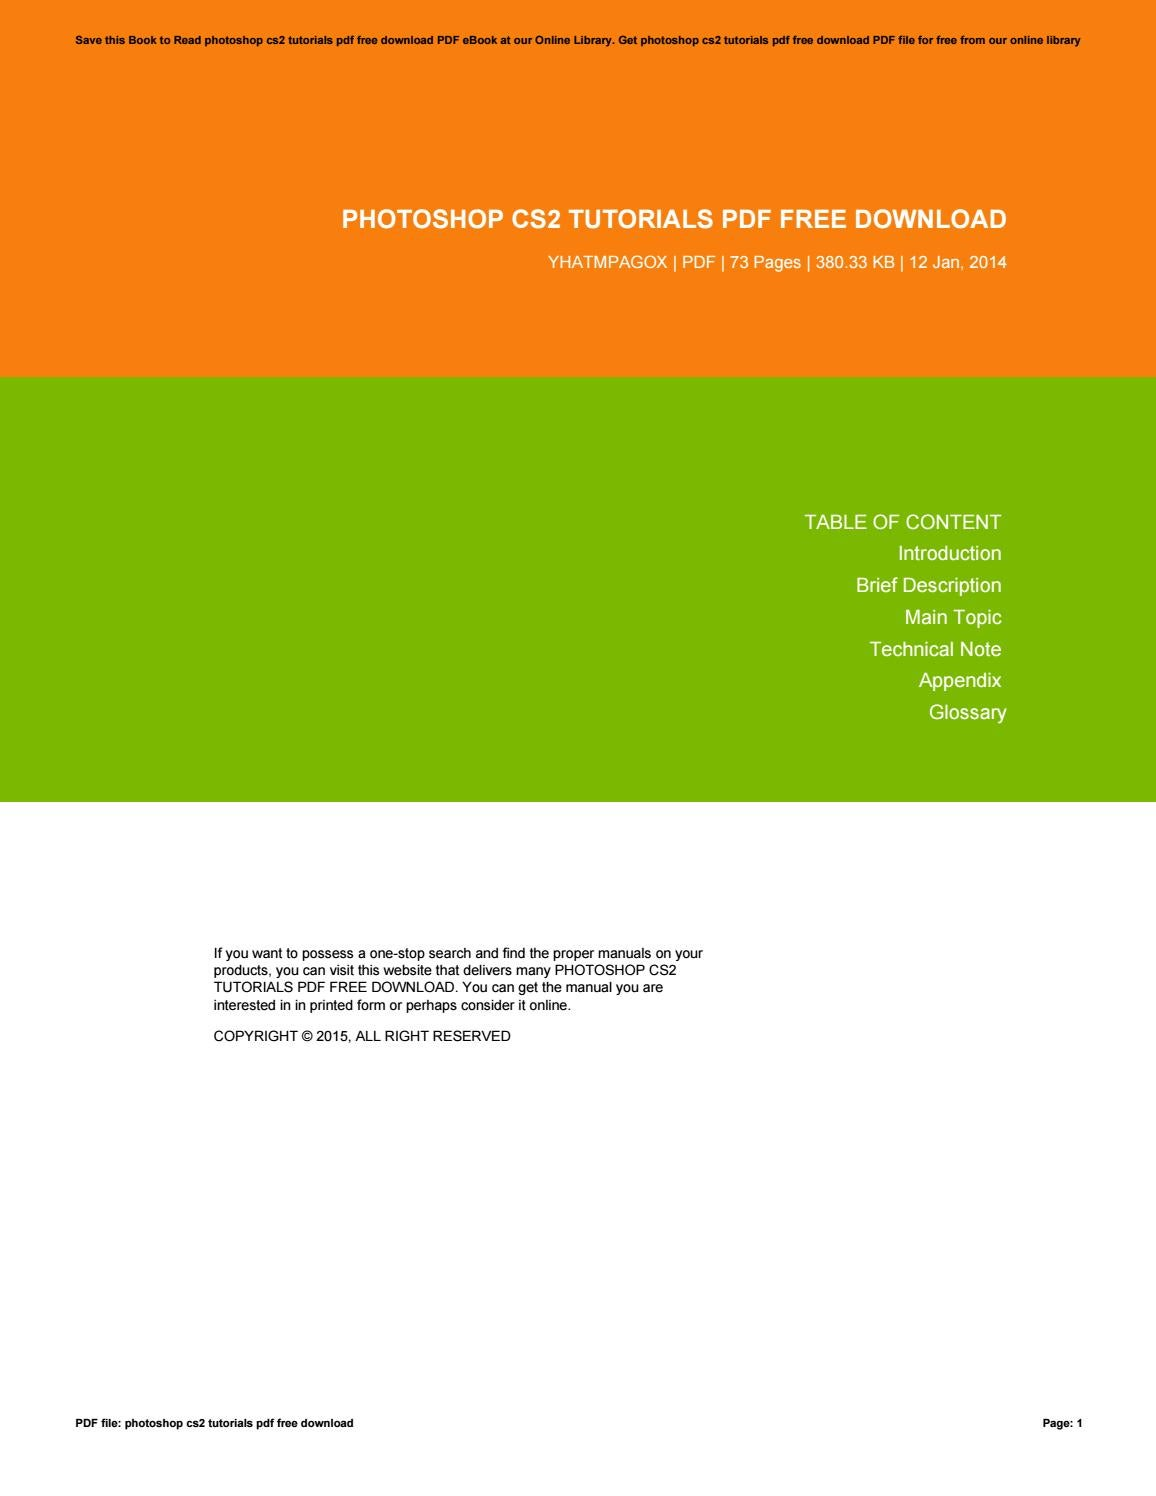 Photoshop tutorial pdf file gallery any tutorial examples photoshop cs2 tutorials pdf free download by raykemp15521 issuu baditri gallery baditri Choice Image